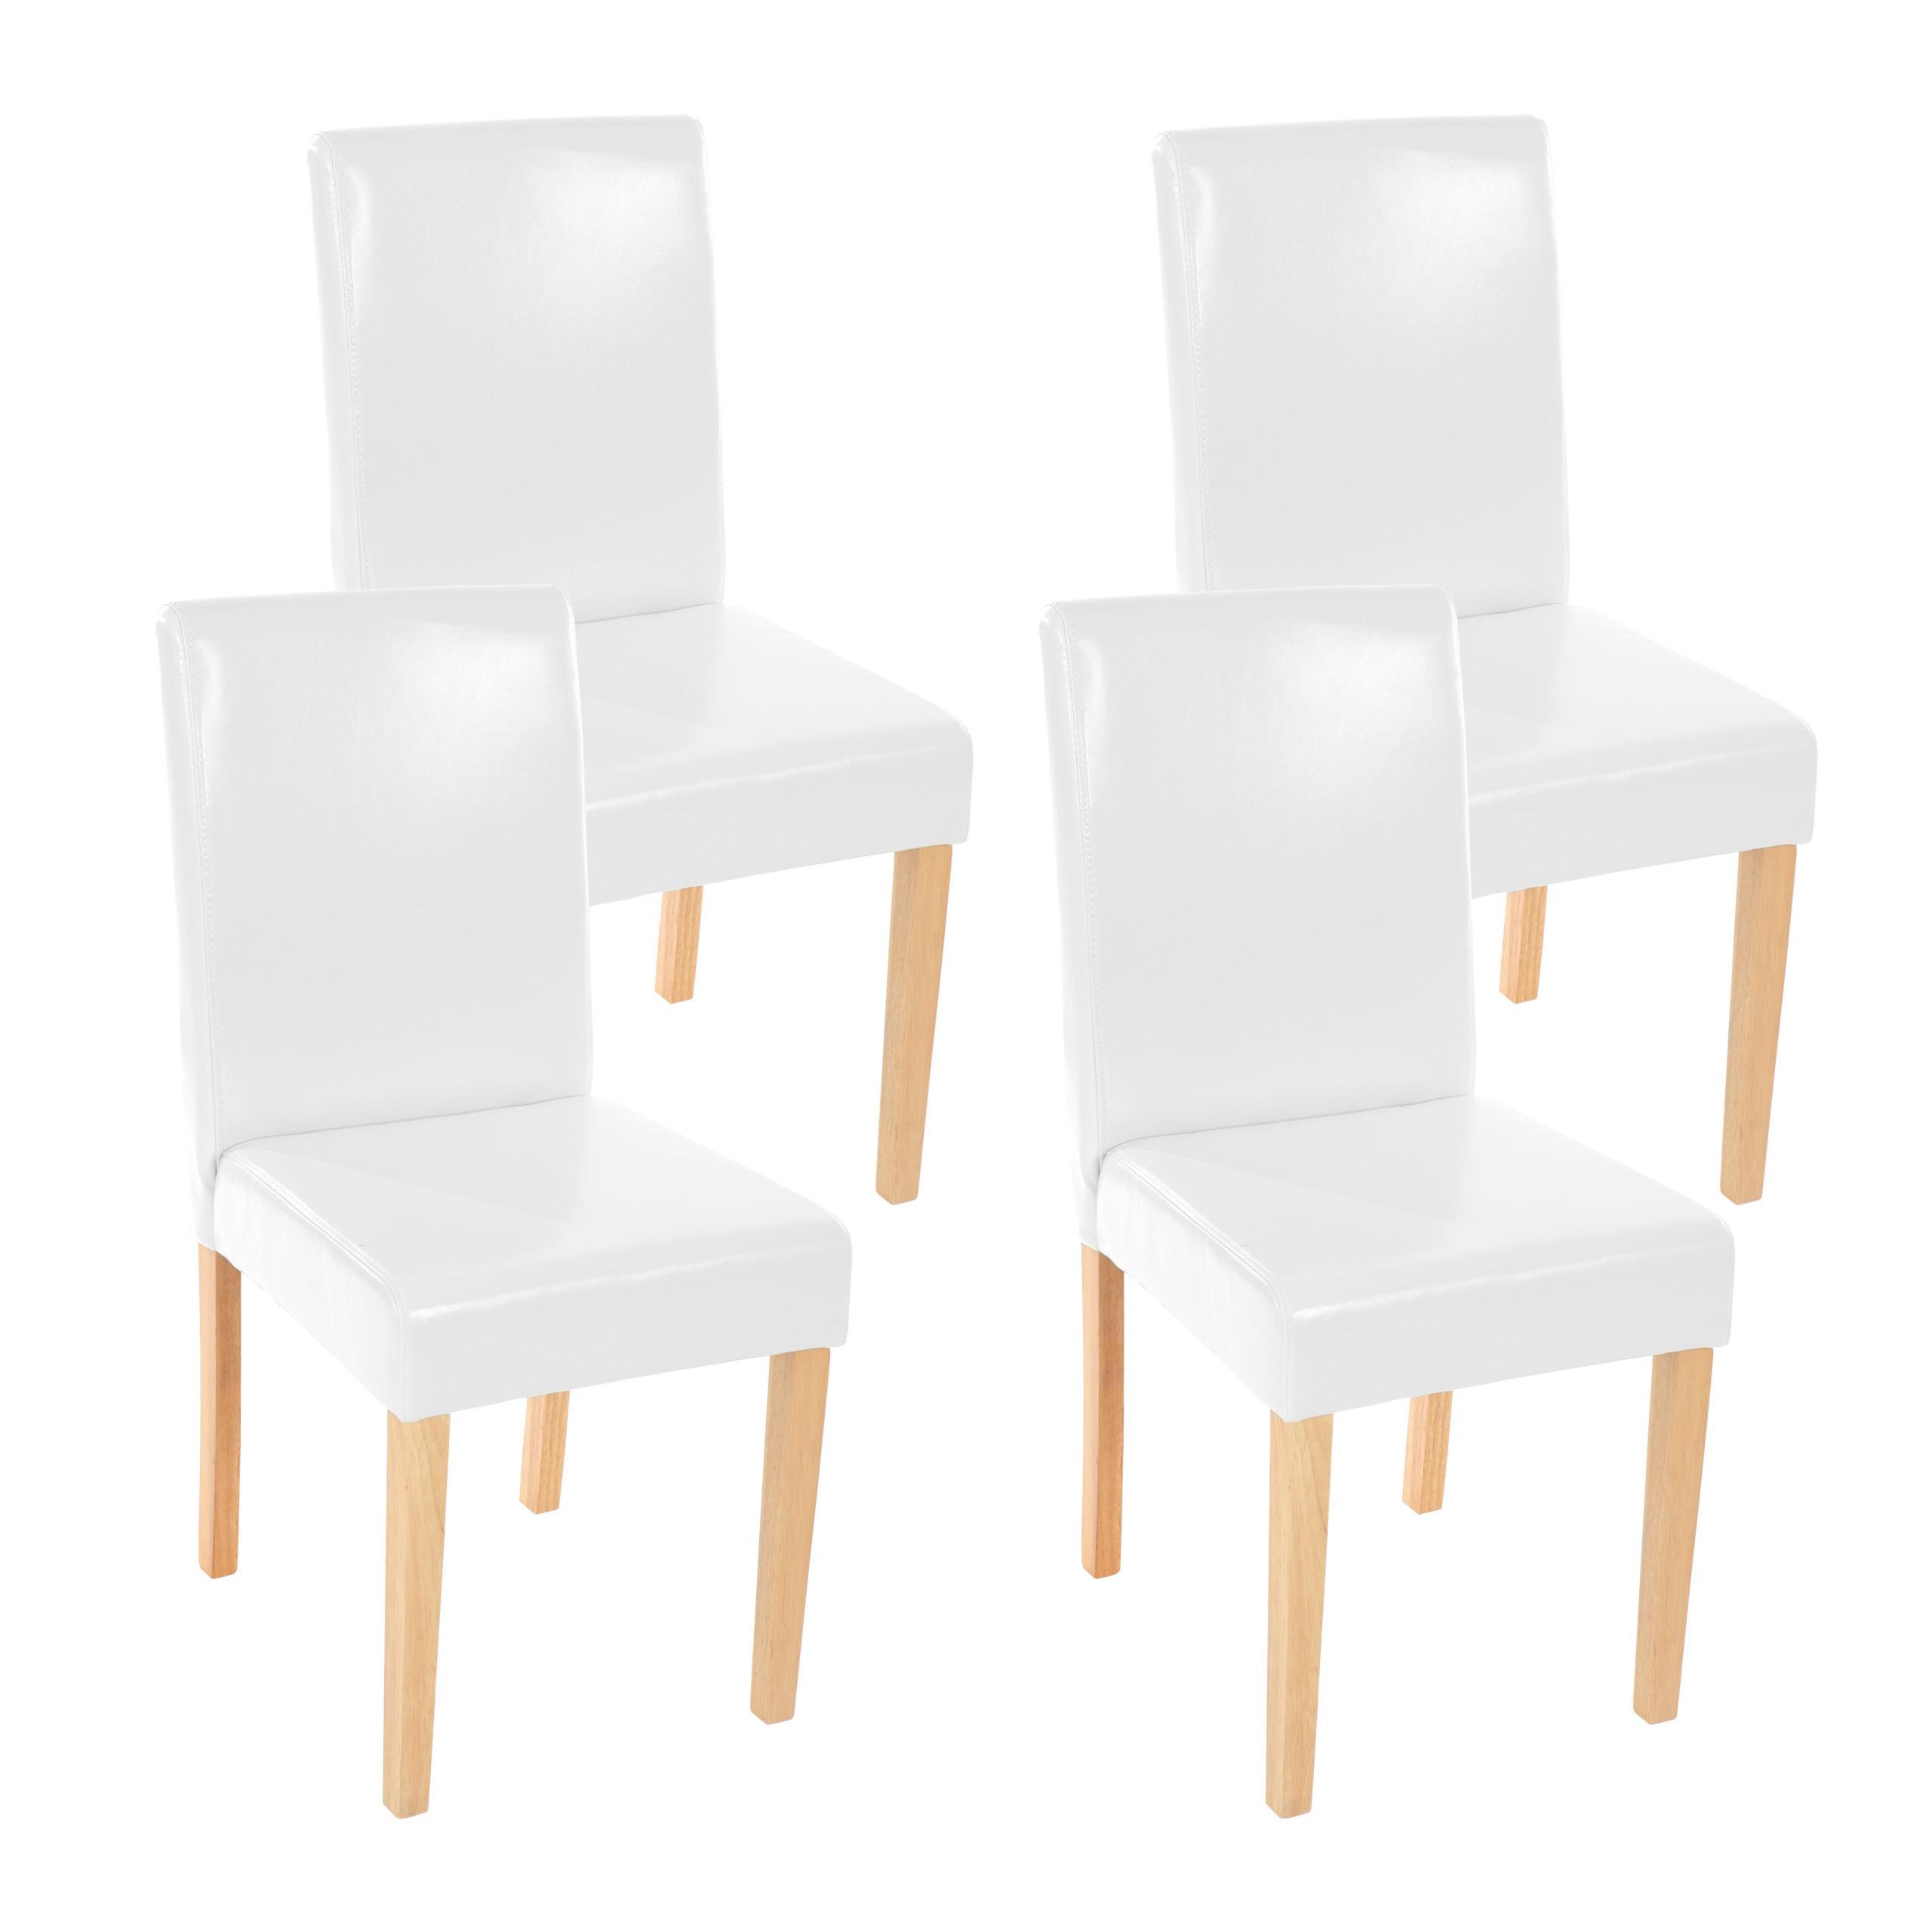 Lote 4 sillas de comedor litau precioso dise o piel for Sillas de comedor de piel